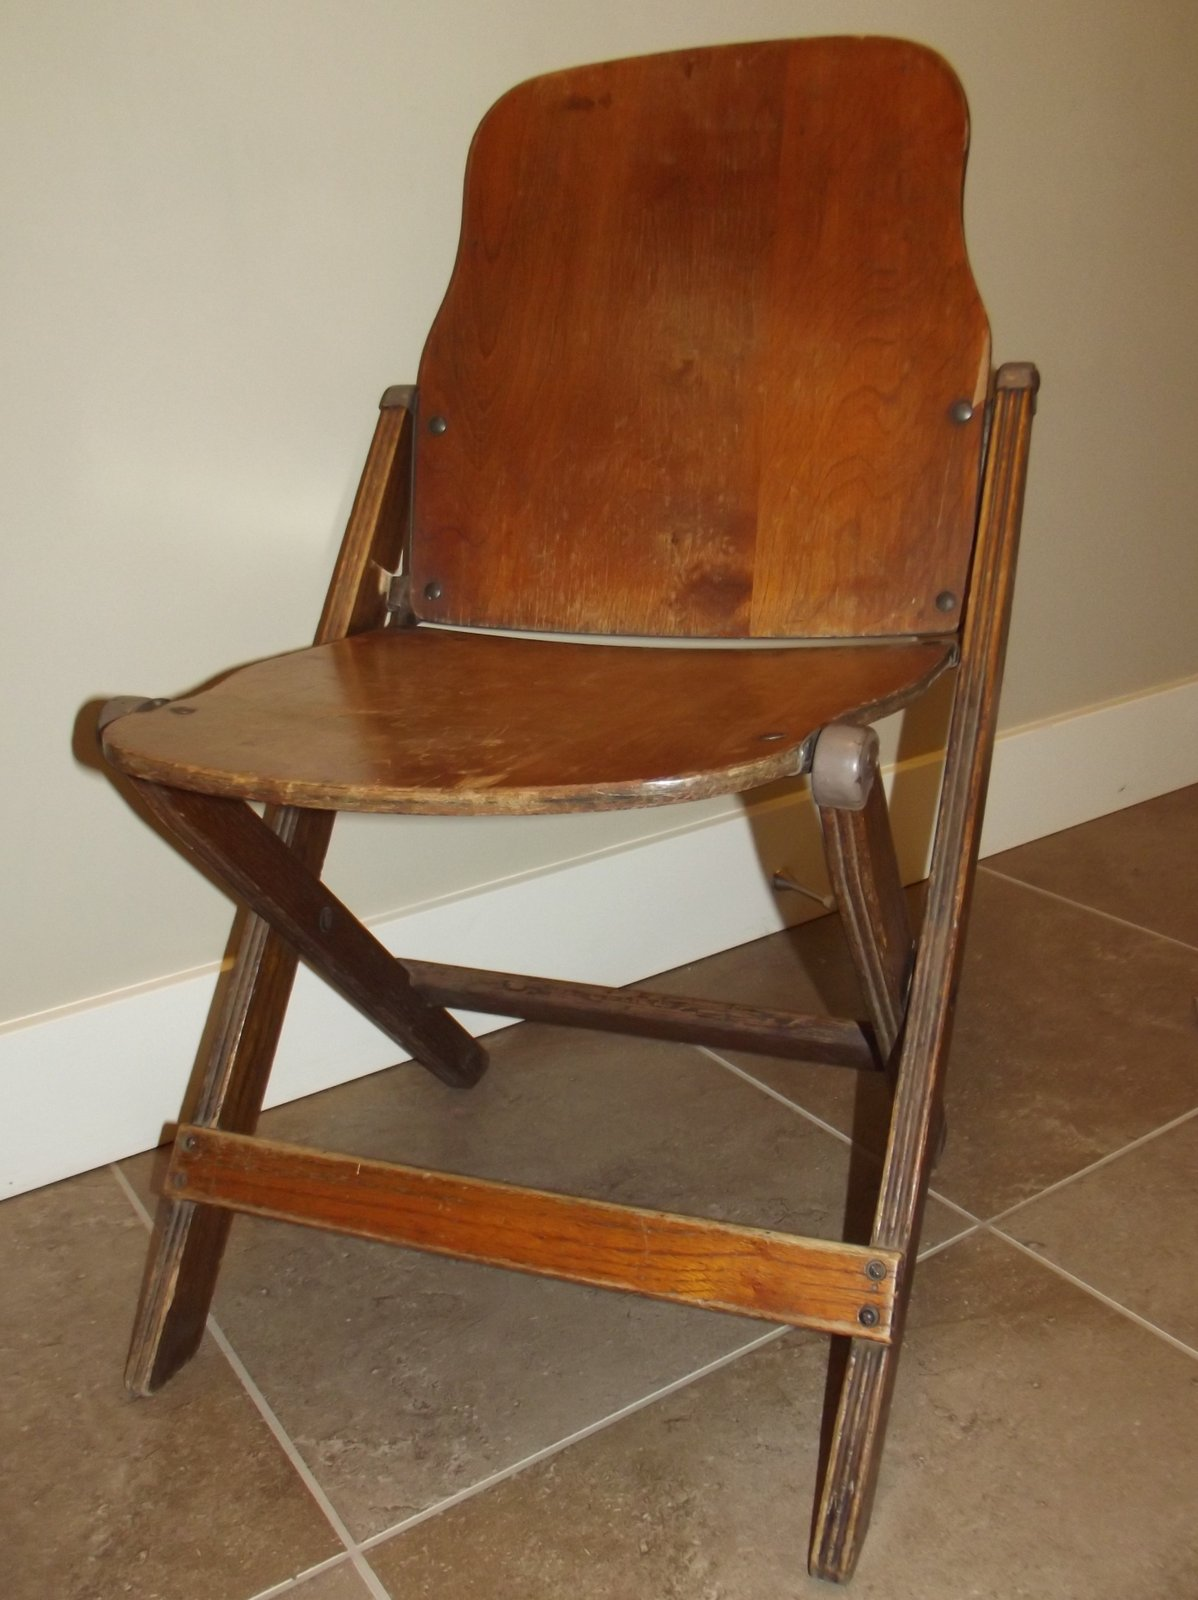 Folding Chair Kijiji Beach Chairs Amazon Sustainable Slow Stylish September 2012